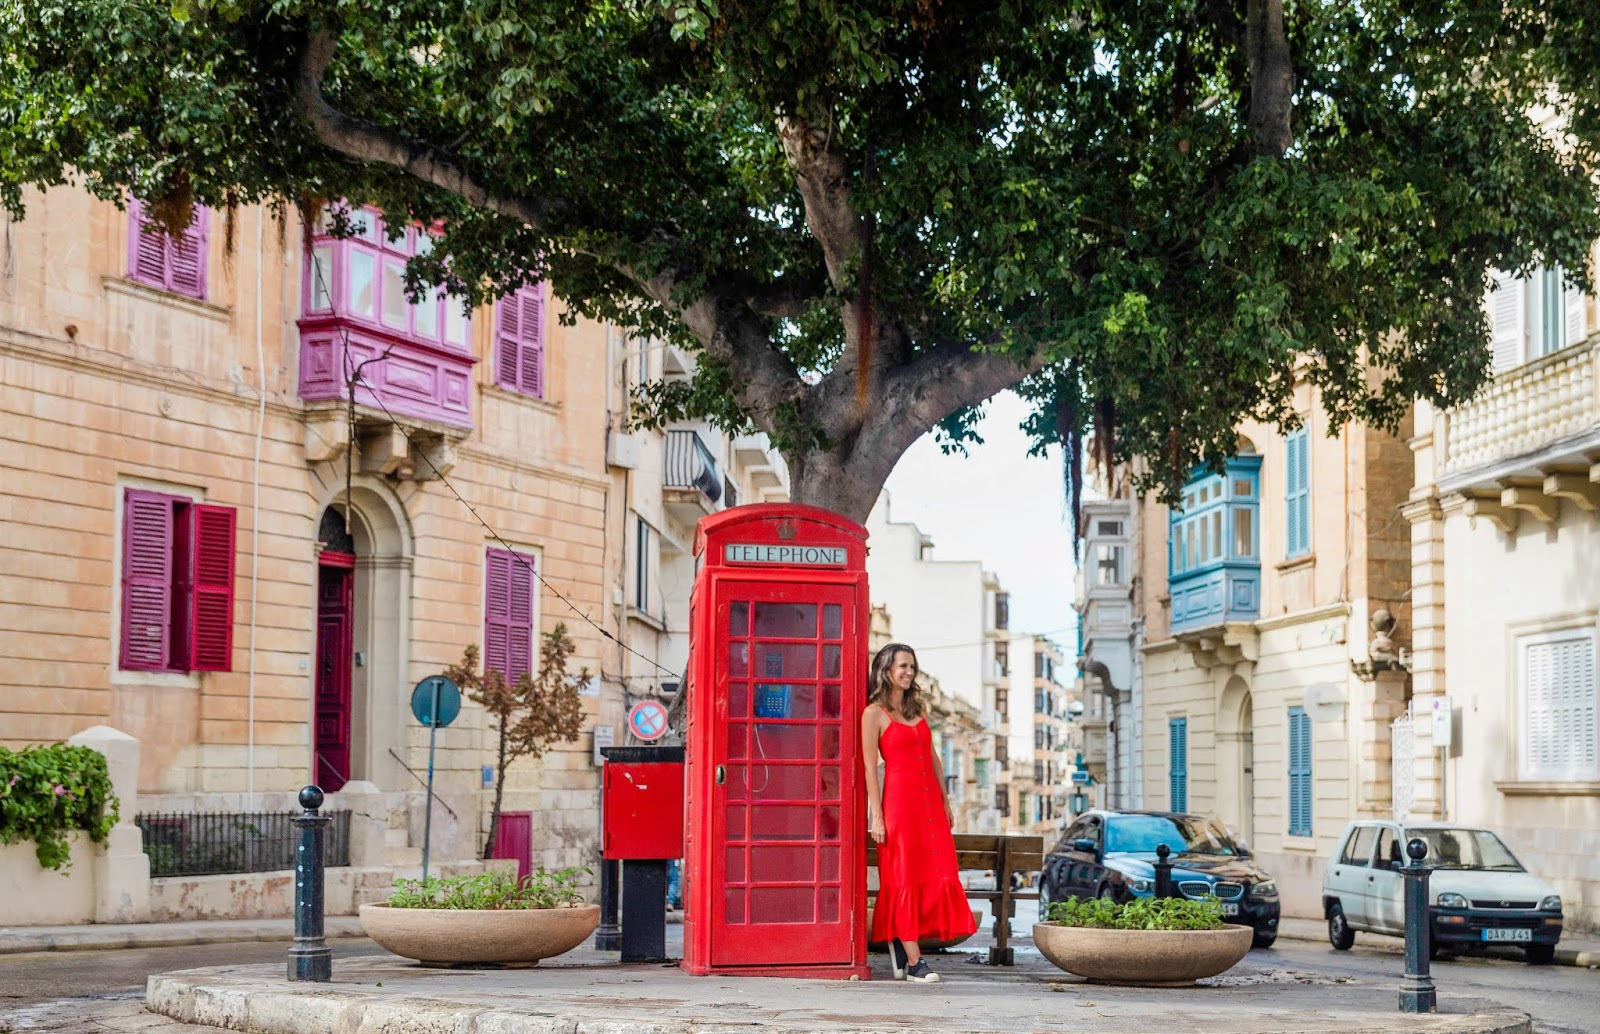 Fotógrafos brasileiros em Malta